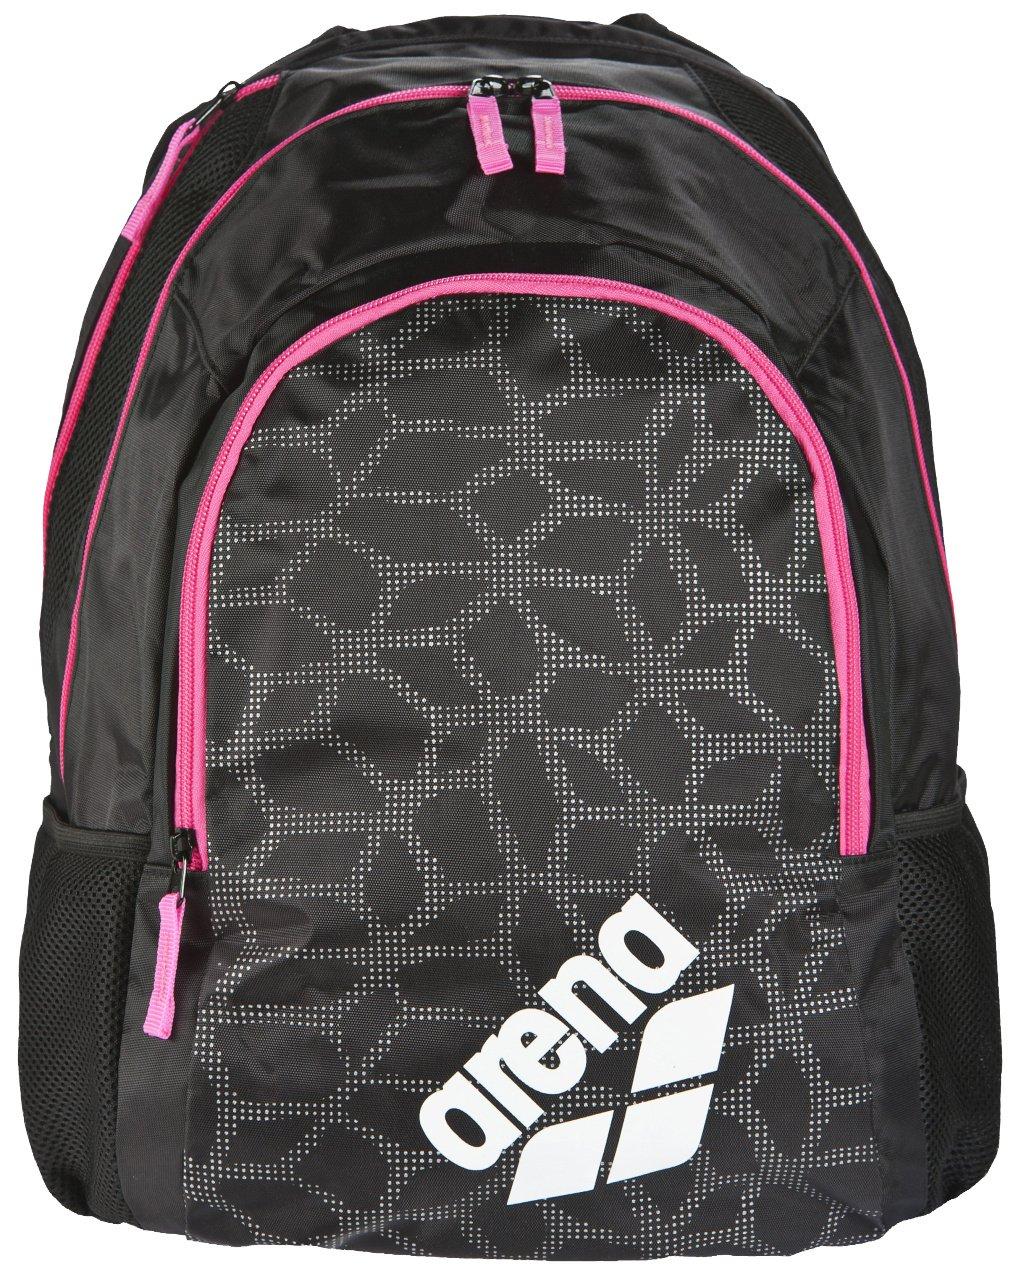 (One Size, Black X/Pivot/Fuchsia) - Arena Spiky 2, Sports Bag Unisex Adult B074PXJZB7